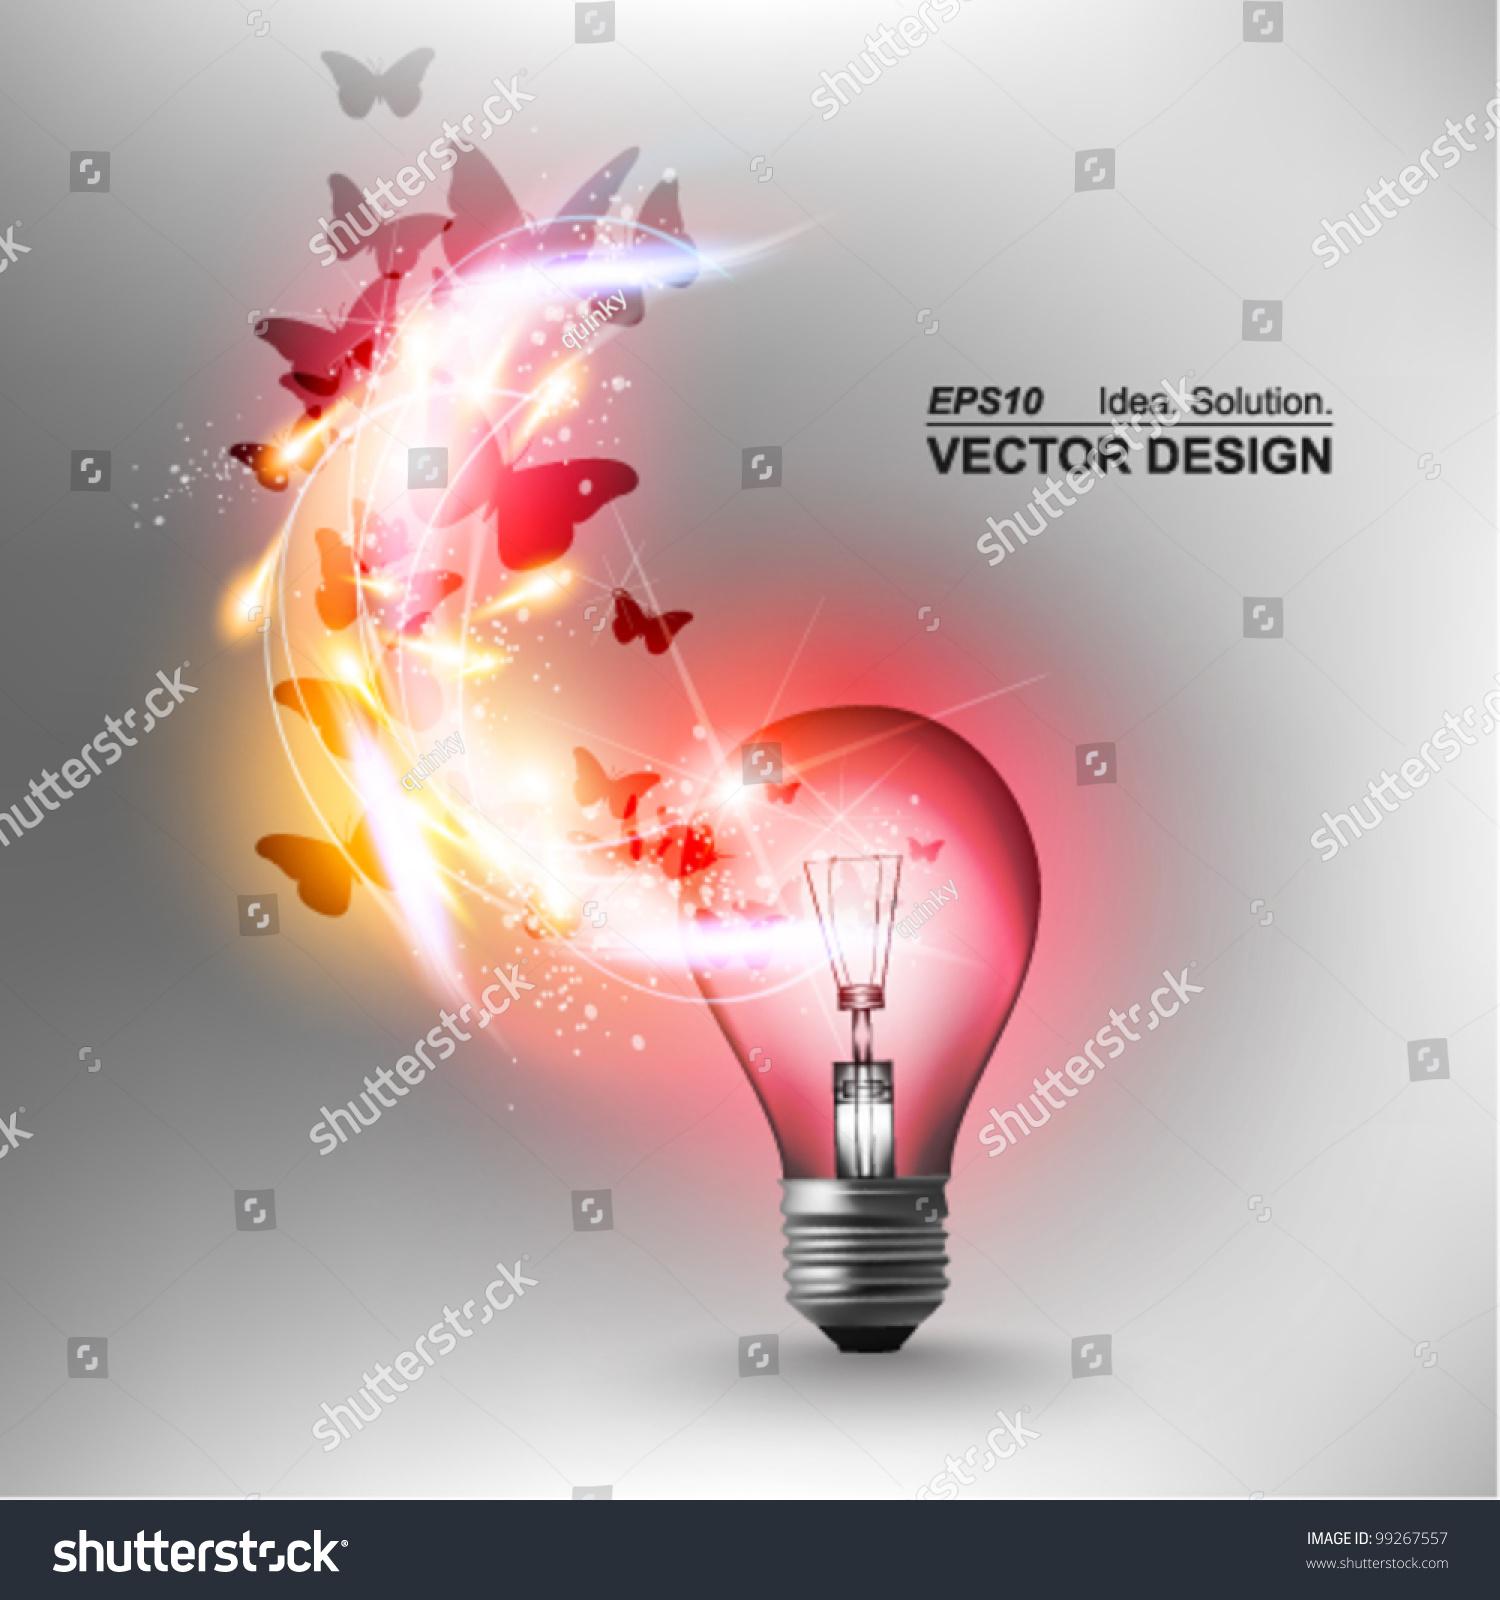 Idea Design idea design photo 2 Stylish Conceptual Digital Light Bulb Idea Design Stock Vector Illustration 99267557 Shutterstock